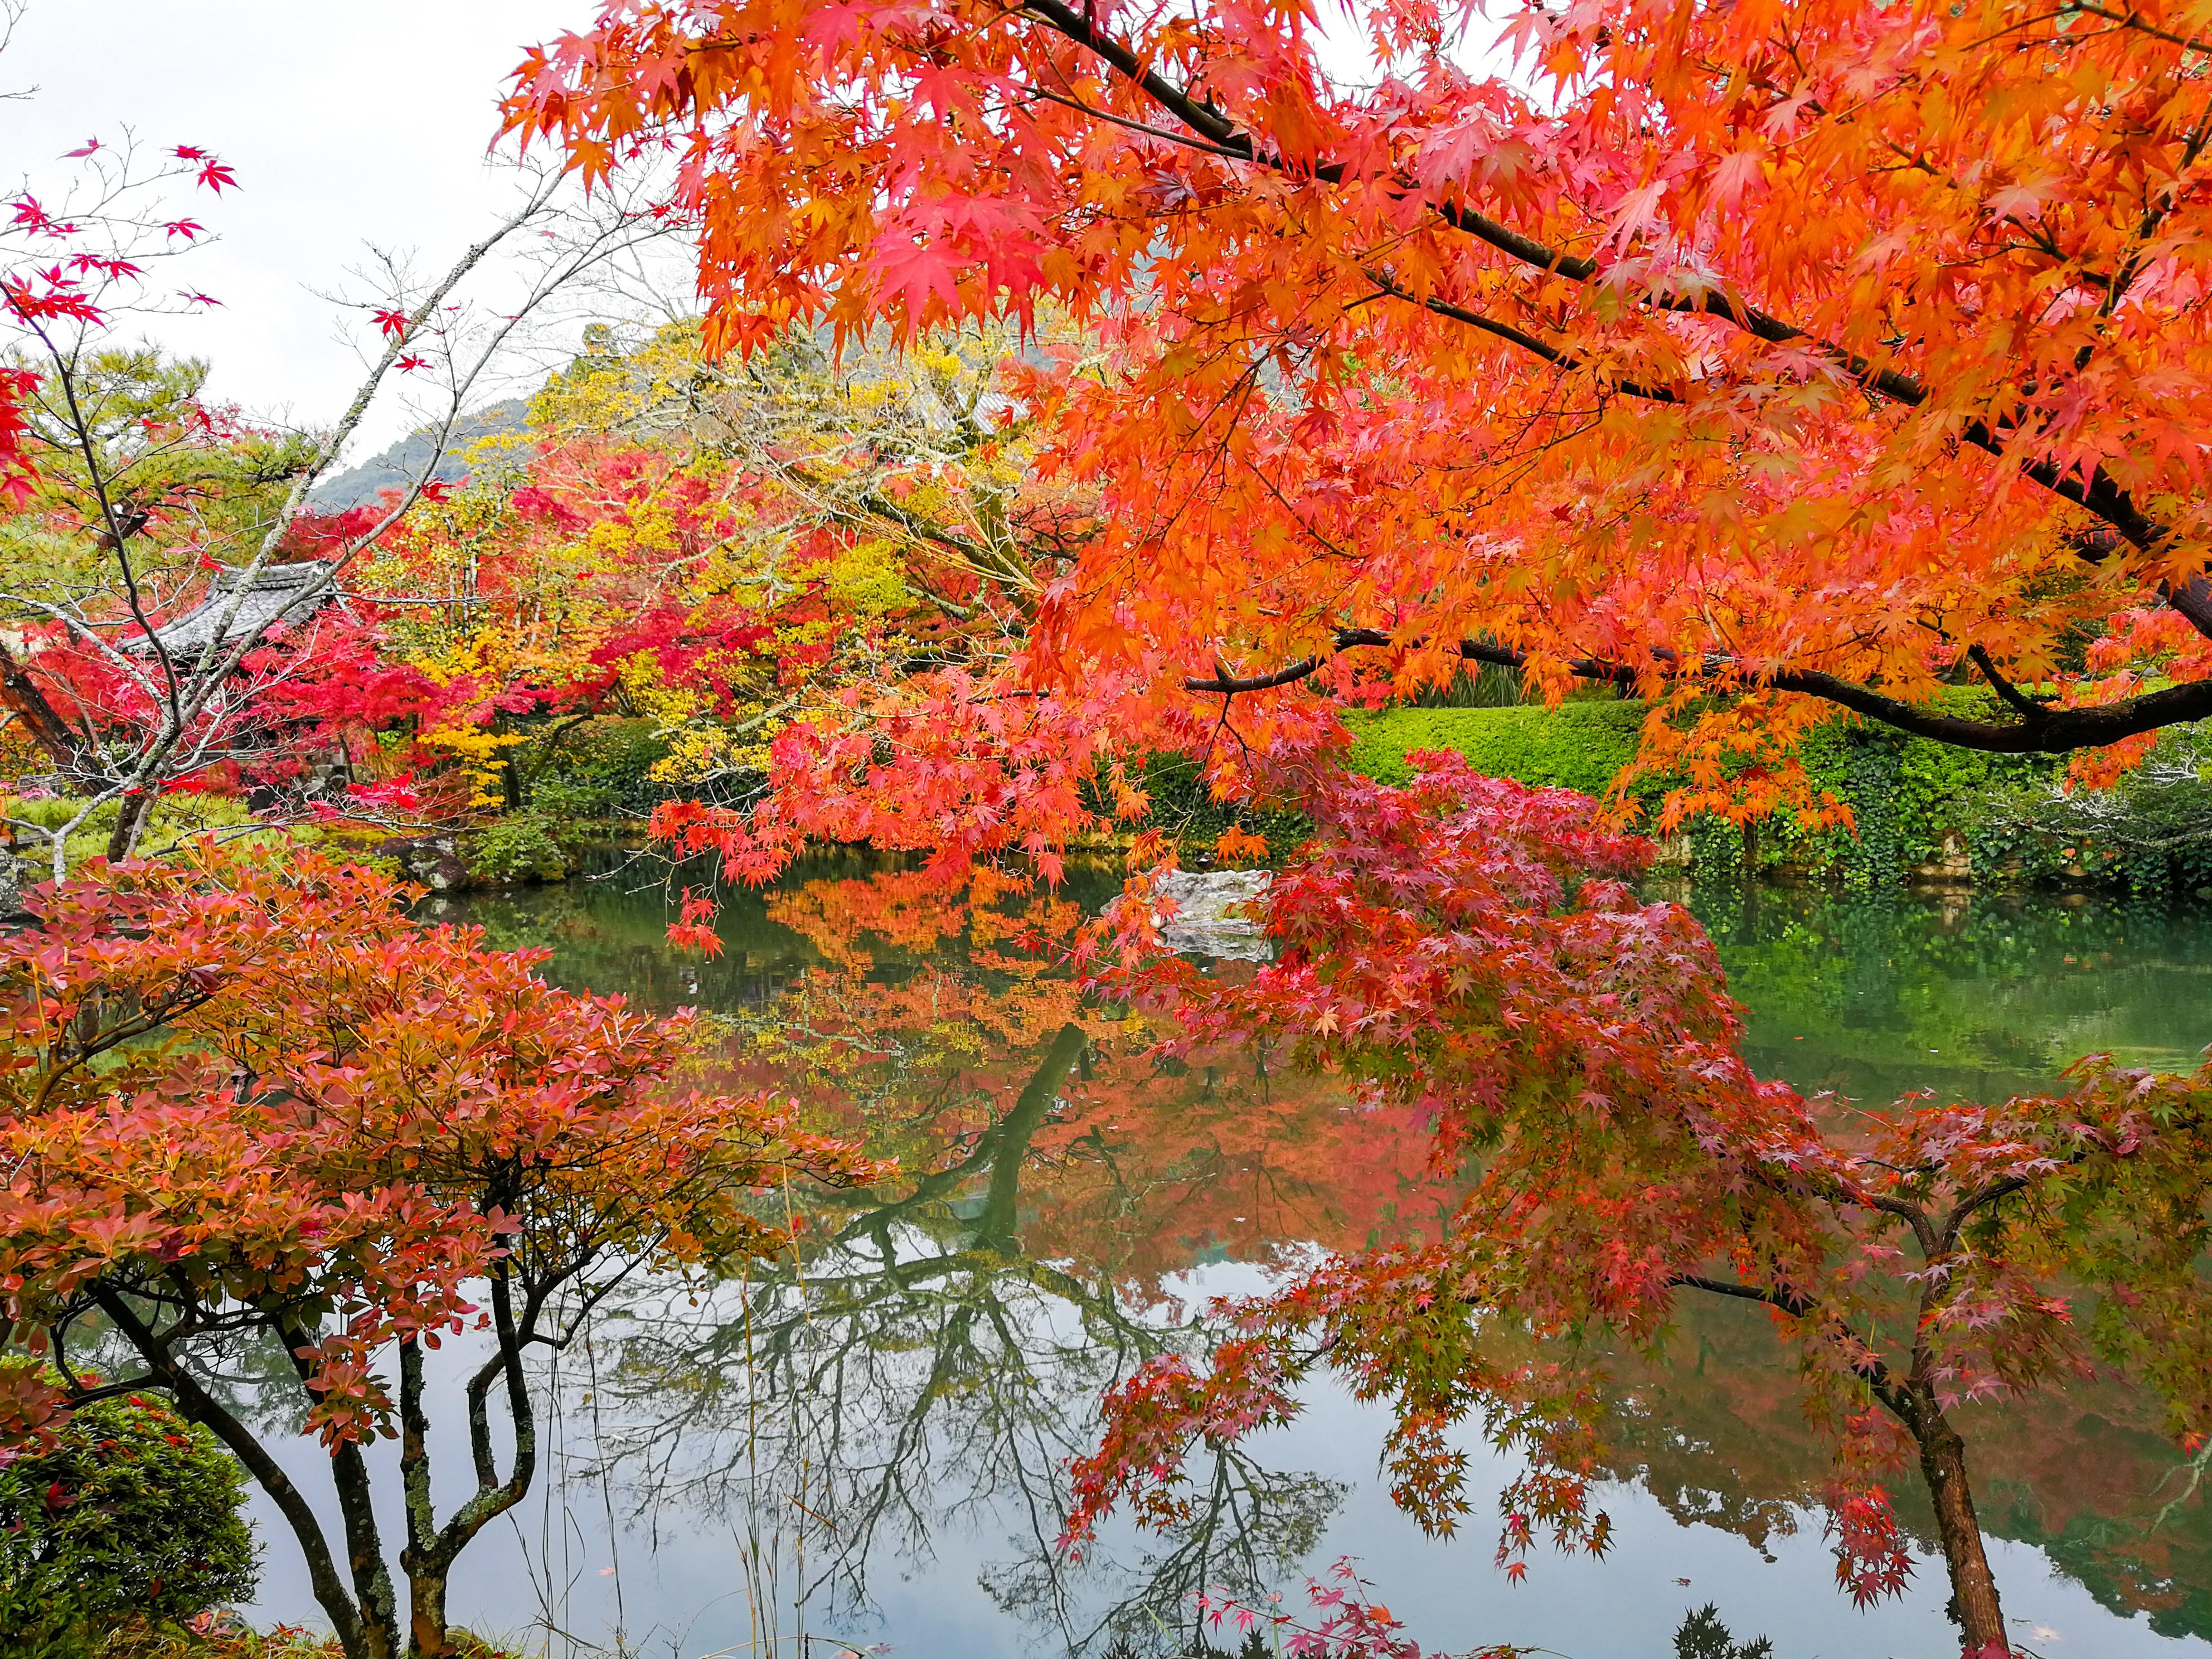 Where to walk through fall foliage in Seattle